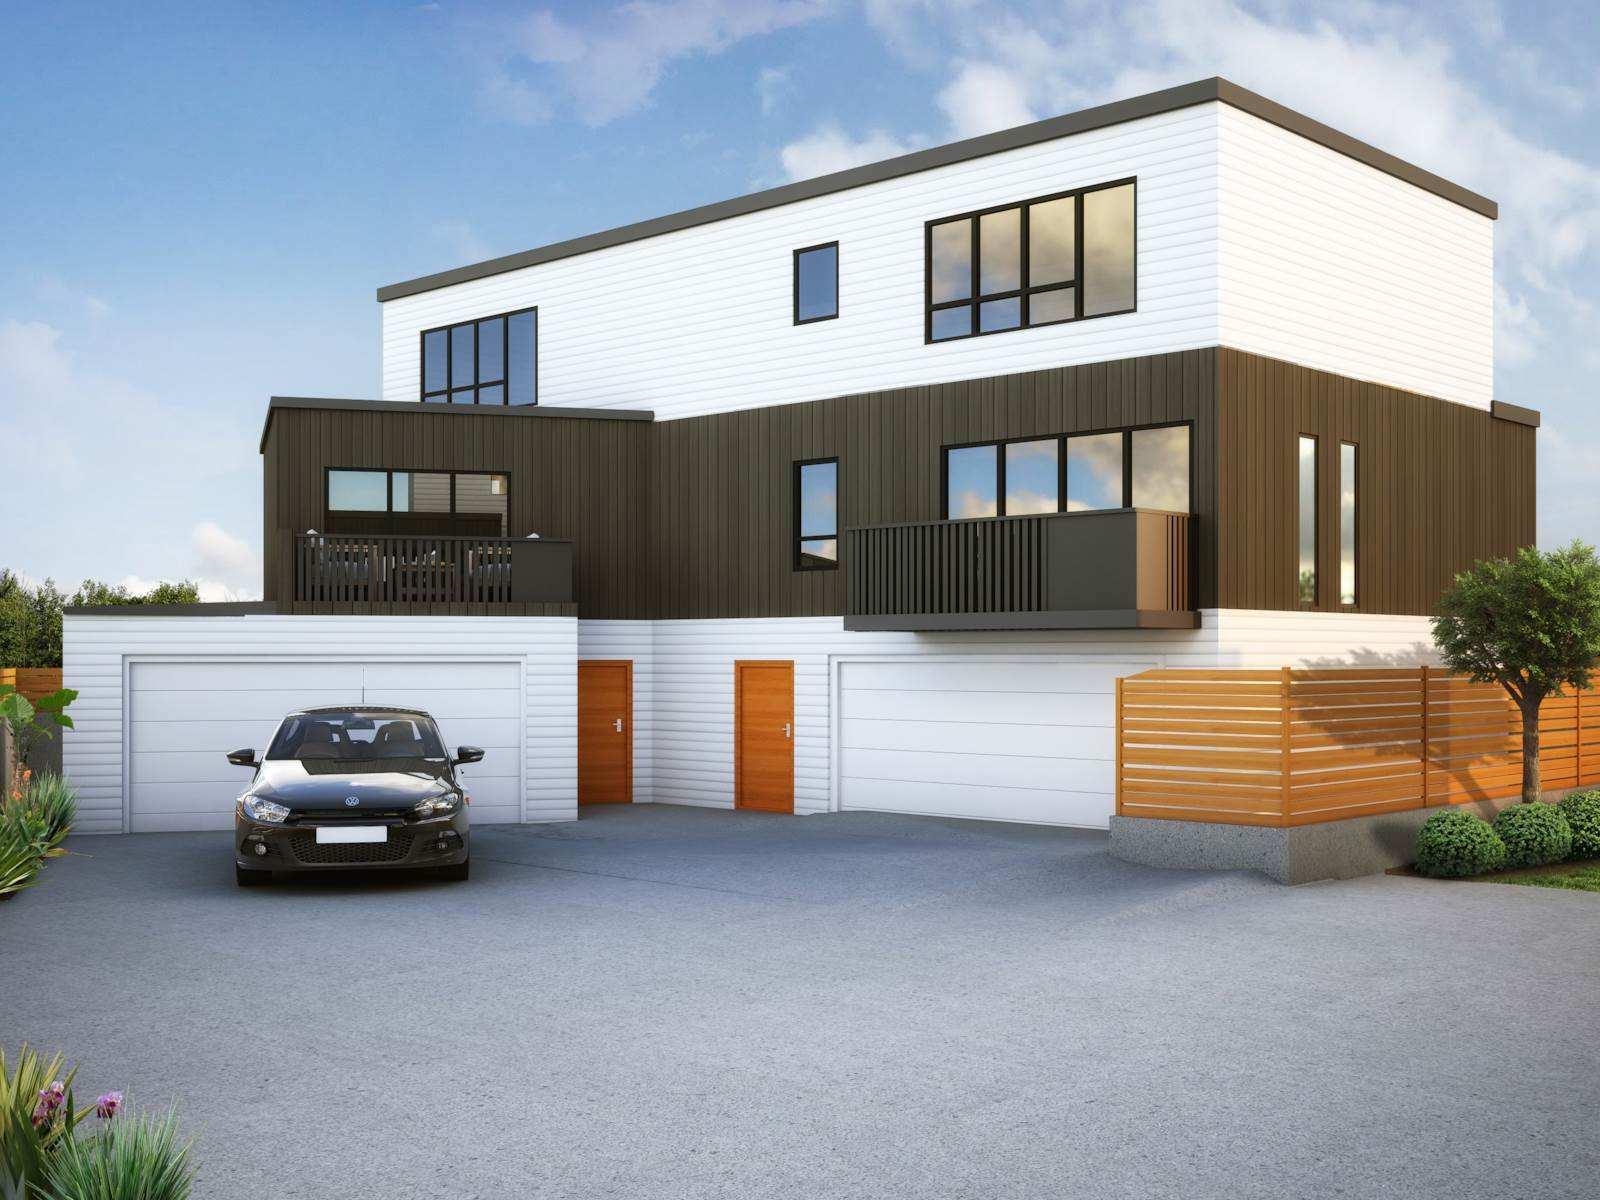 Albany 3房 全新开发项目 10套住宅可选 售价可负担 学校/购物/交通近咫尺 精明买家莫错过 Affordable, Stylish Living